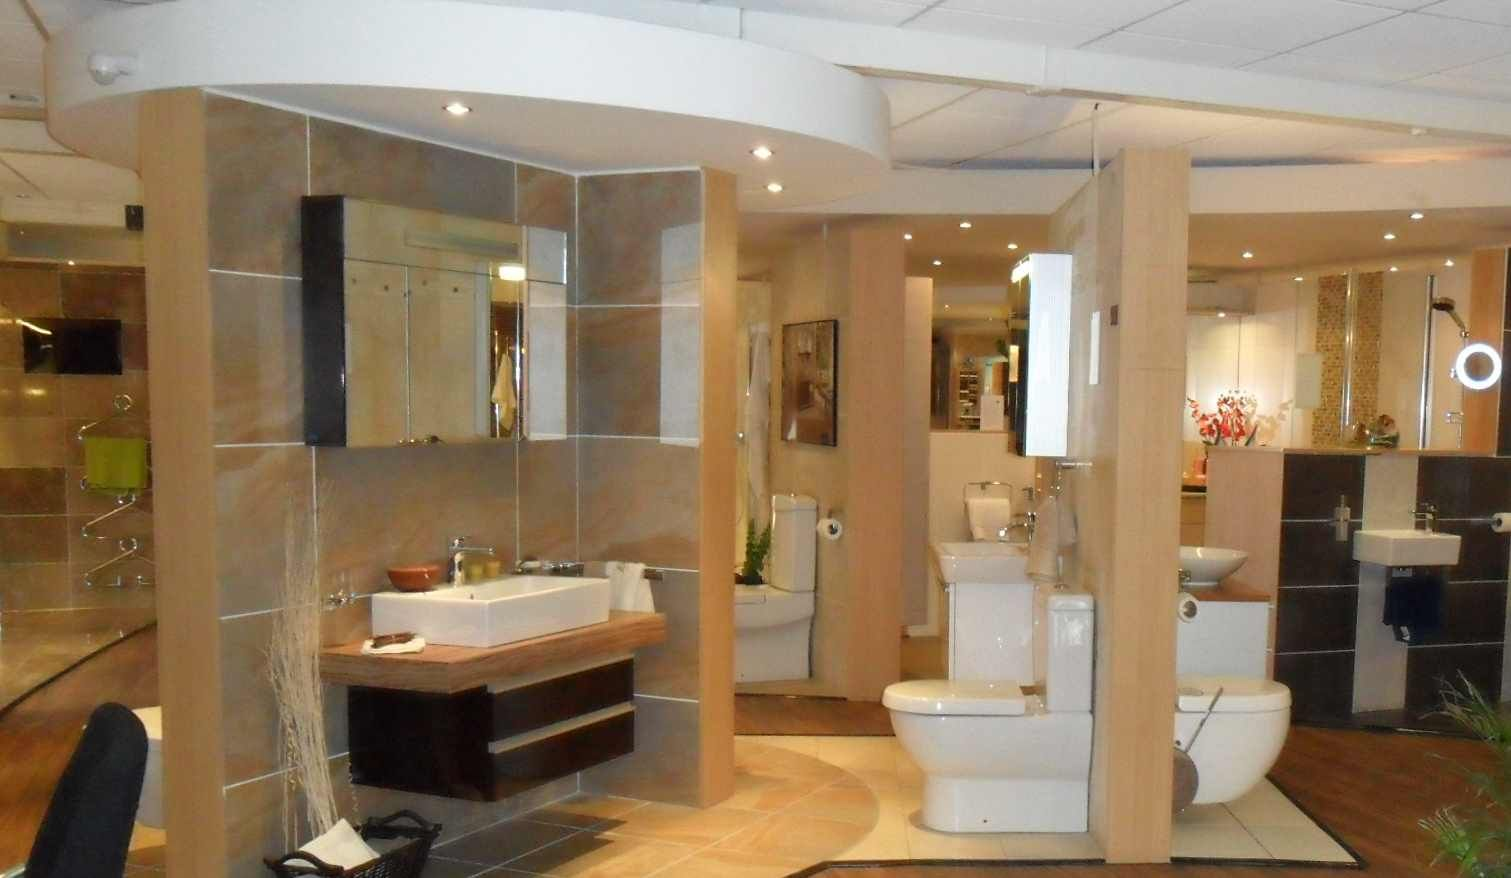 1000 Images About Marble Tiles On Pinterest   Slate Bathroom. Natural Stone Tile Bathroom Ideas   Rukinet com